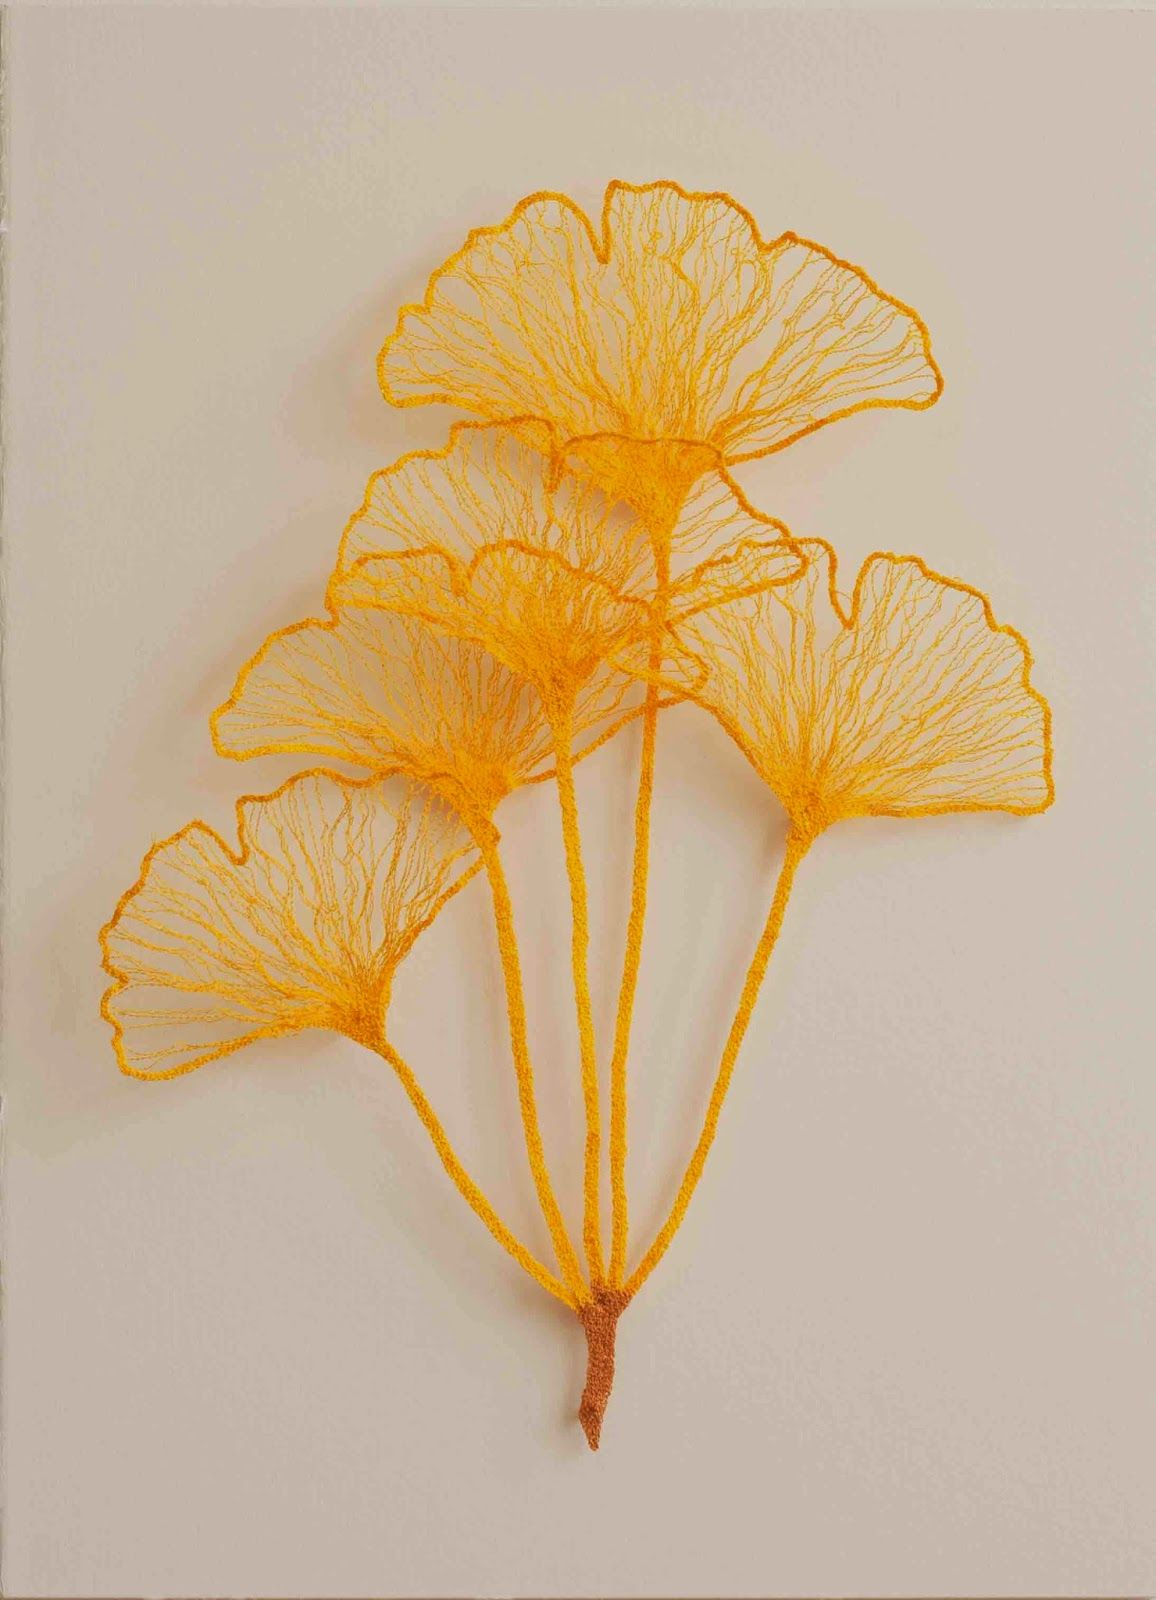 The Artwork of Meredith Woolnough: Little Ginkgo studies (crochet inspiration )